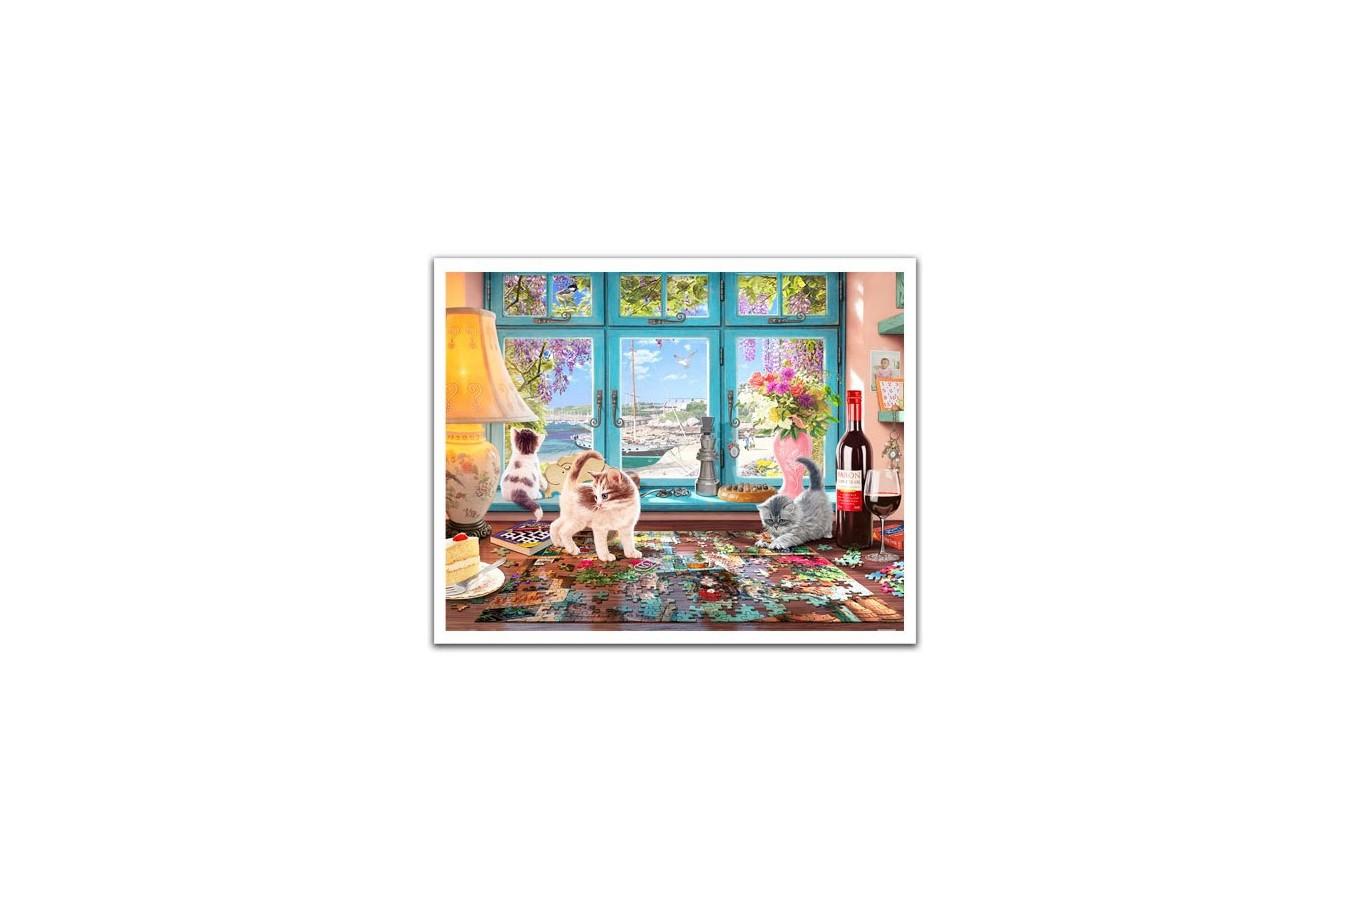 Puzzle din plastic Pintoo - Steve Read: Puzzlers Desk, 2.000 piese (H1986) imagine